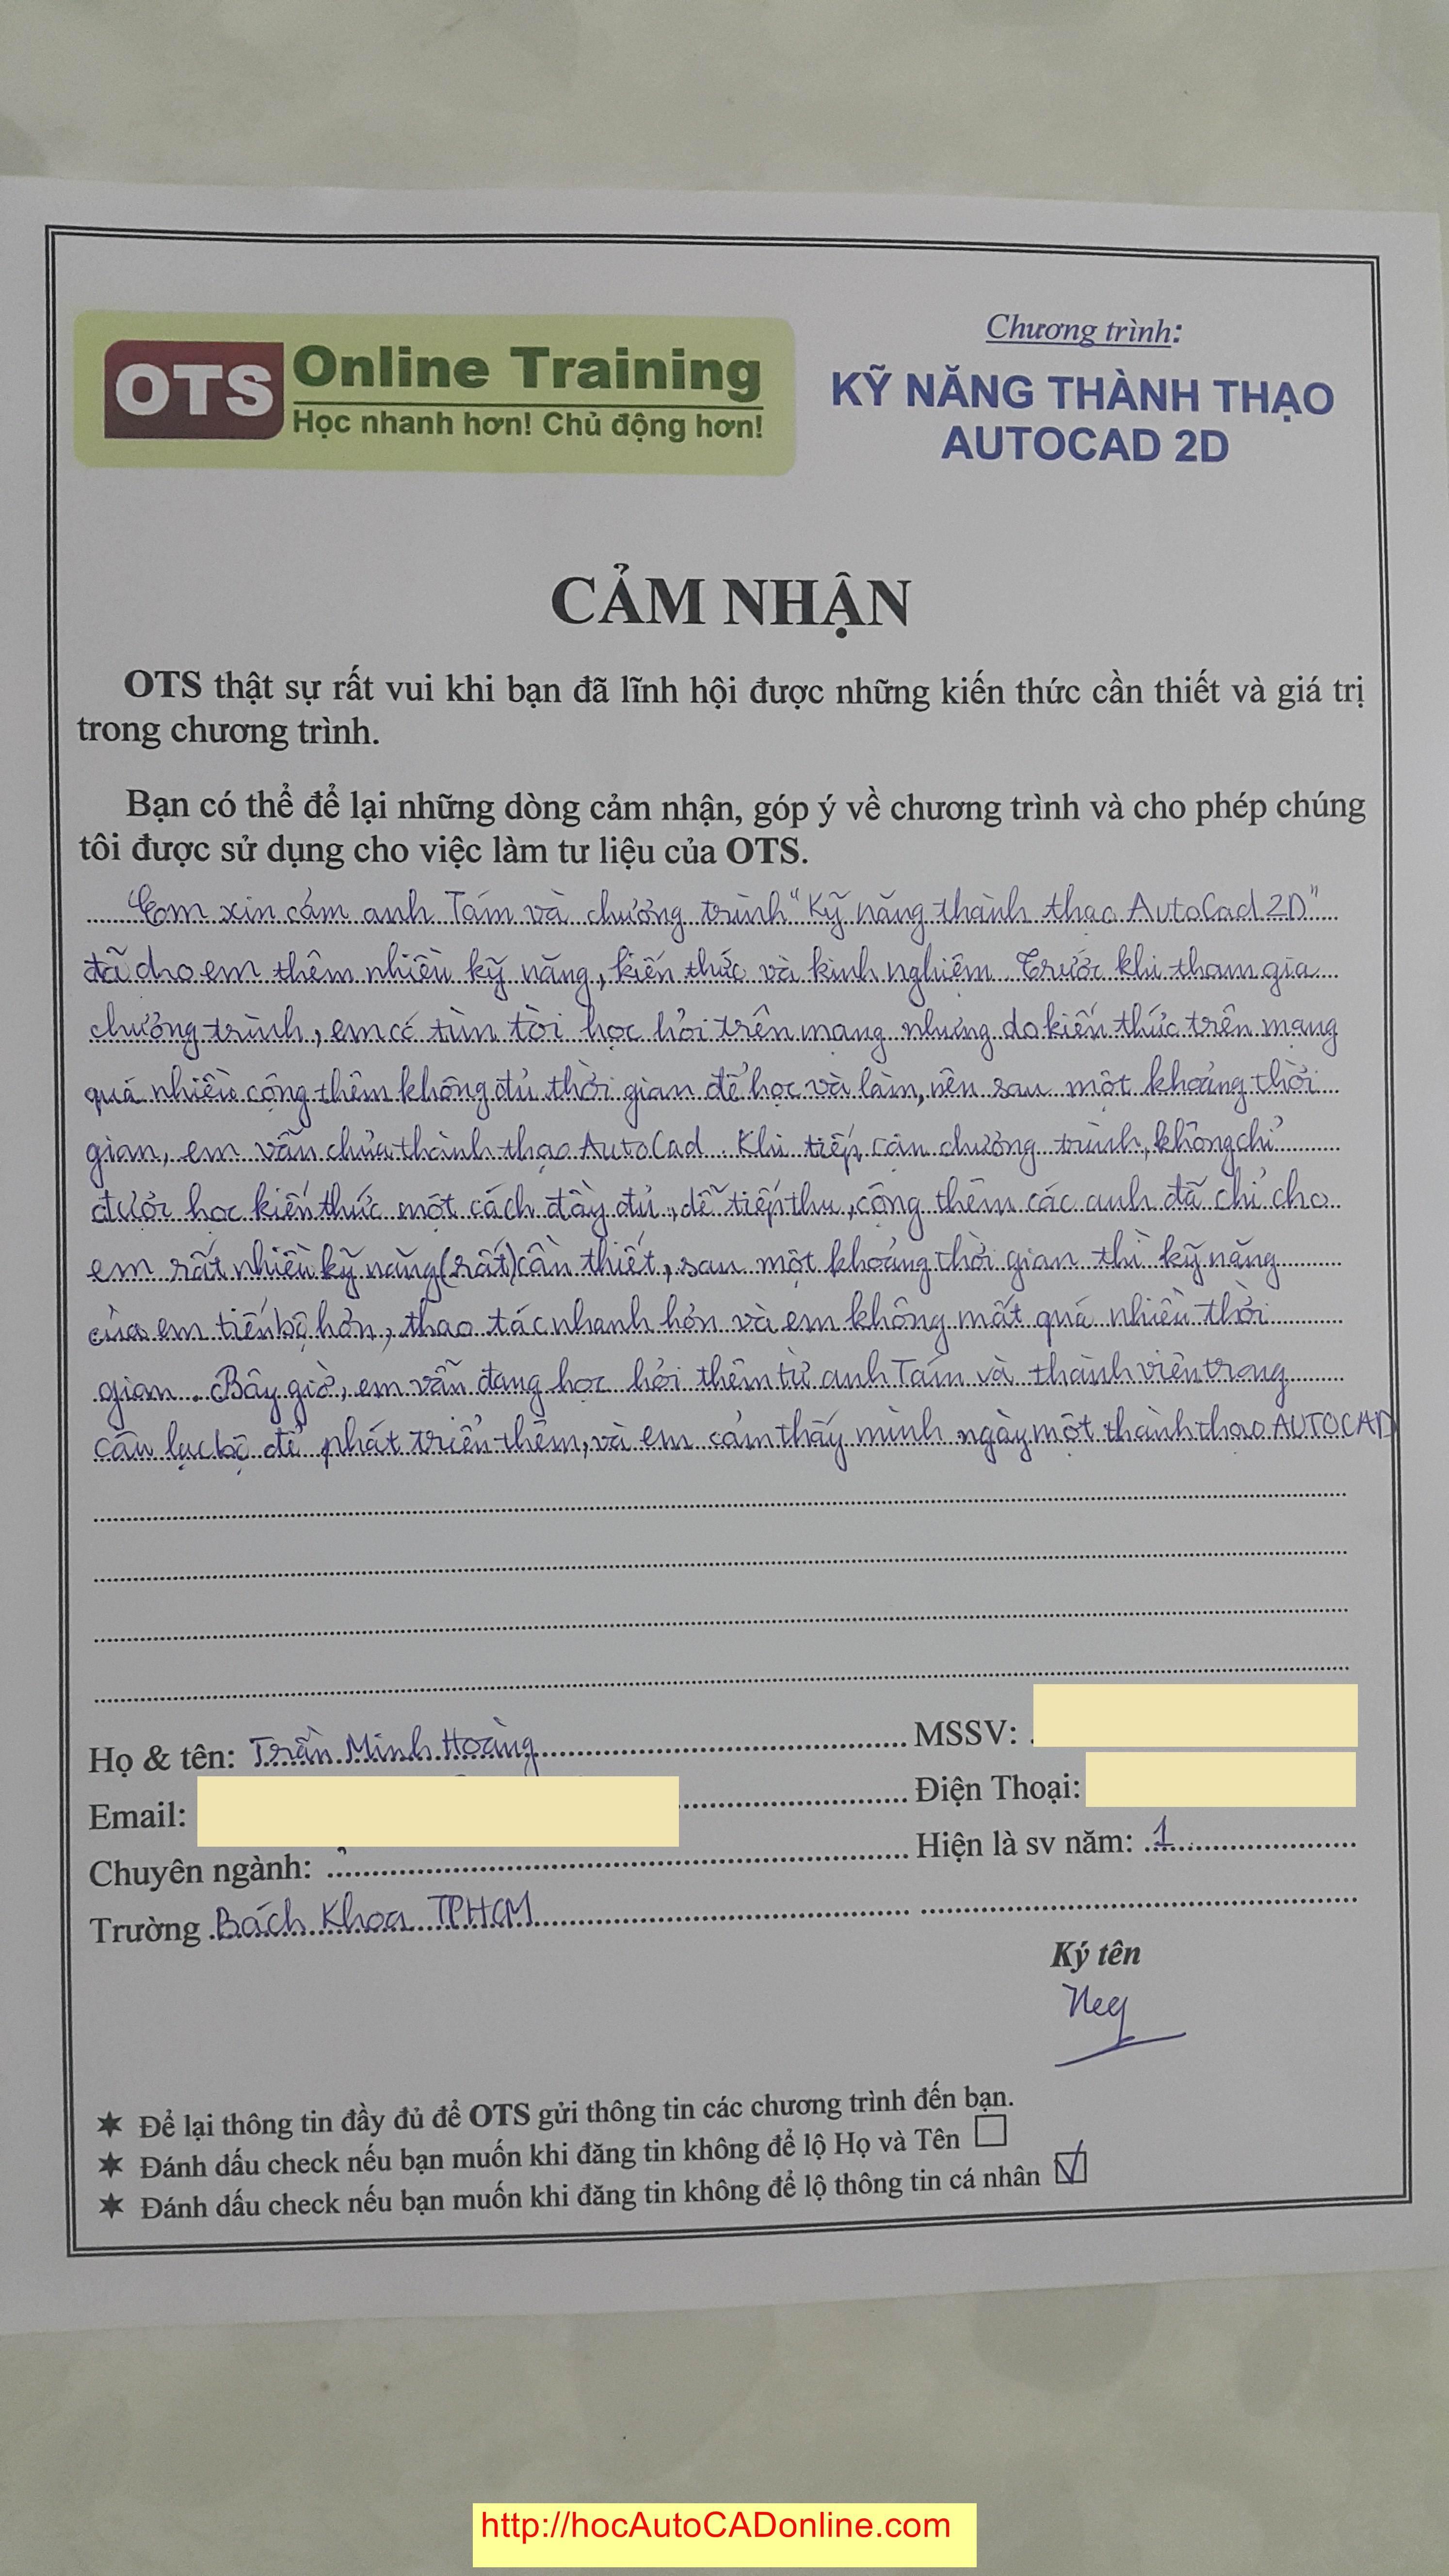 Cam nhan hoc AutoCAD online cua Tran Minh Hoang - Dai Hoc Bach Khoa TPHCM